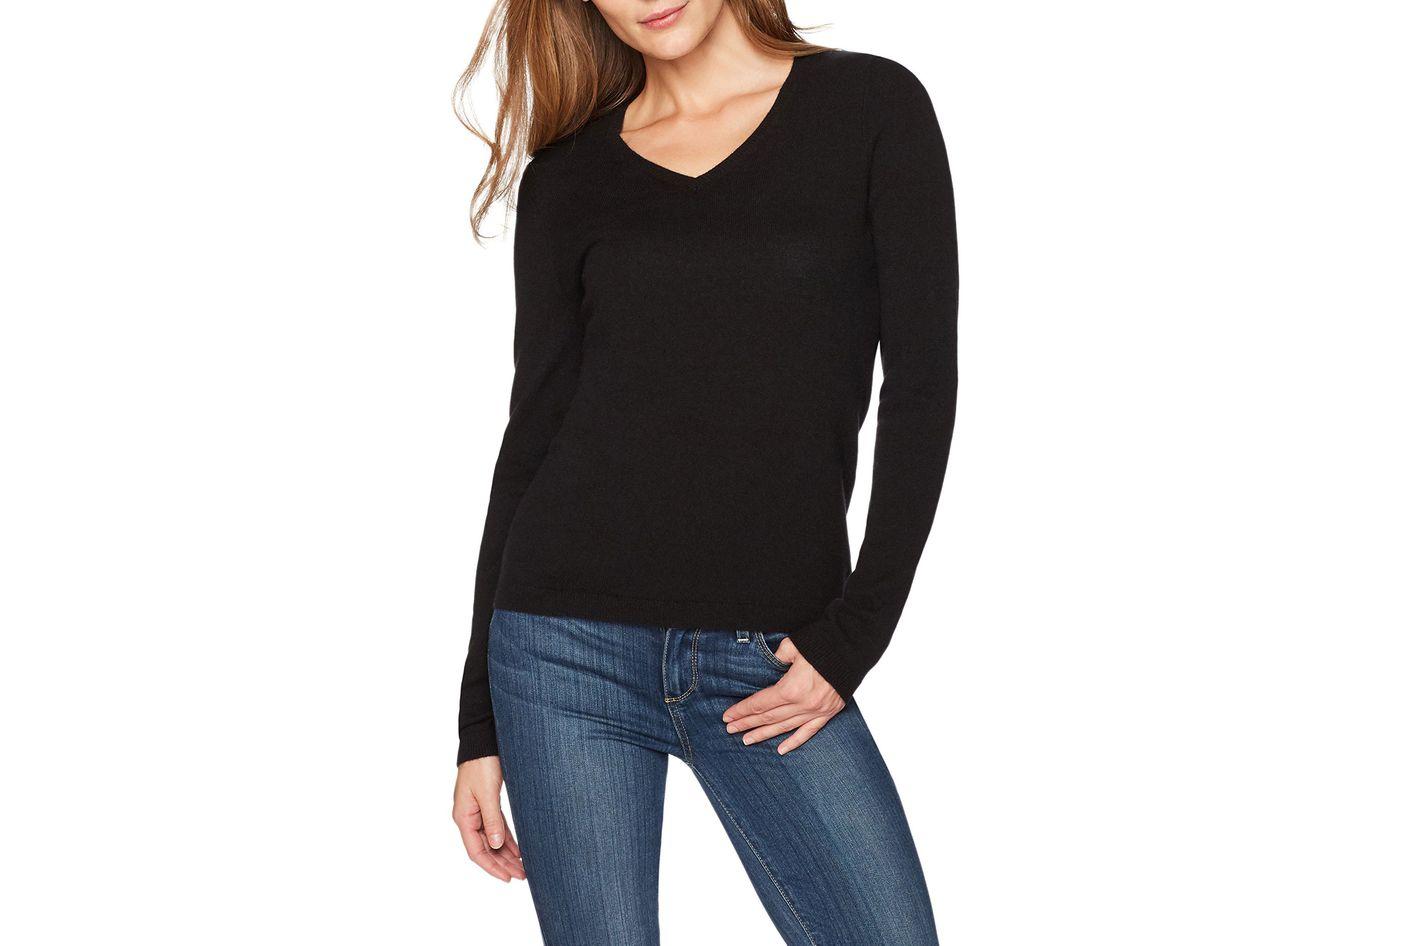 Lark & Ro Women's 100 Percent Cashmere 12-Gauge V-Neck Pullover Sweater